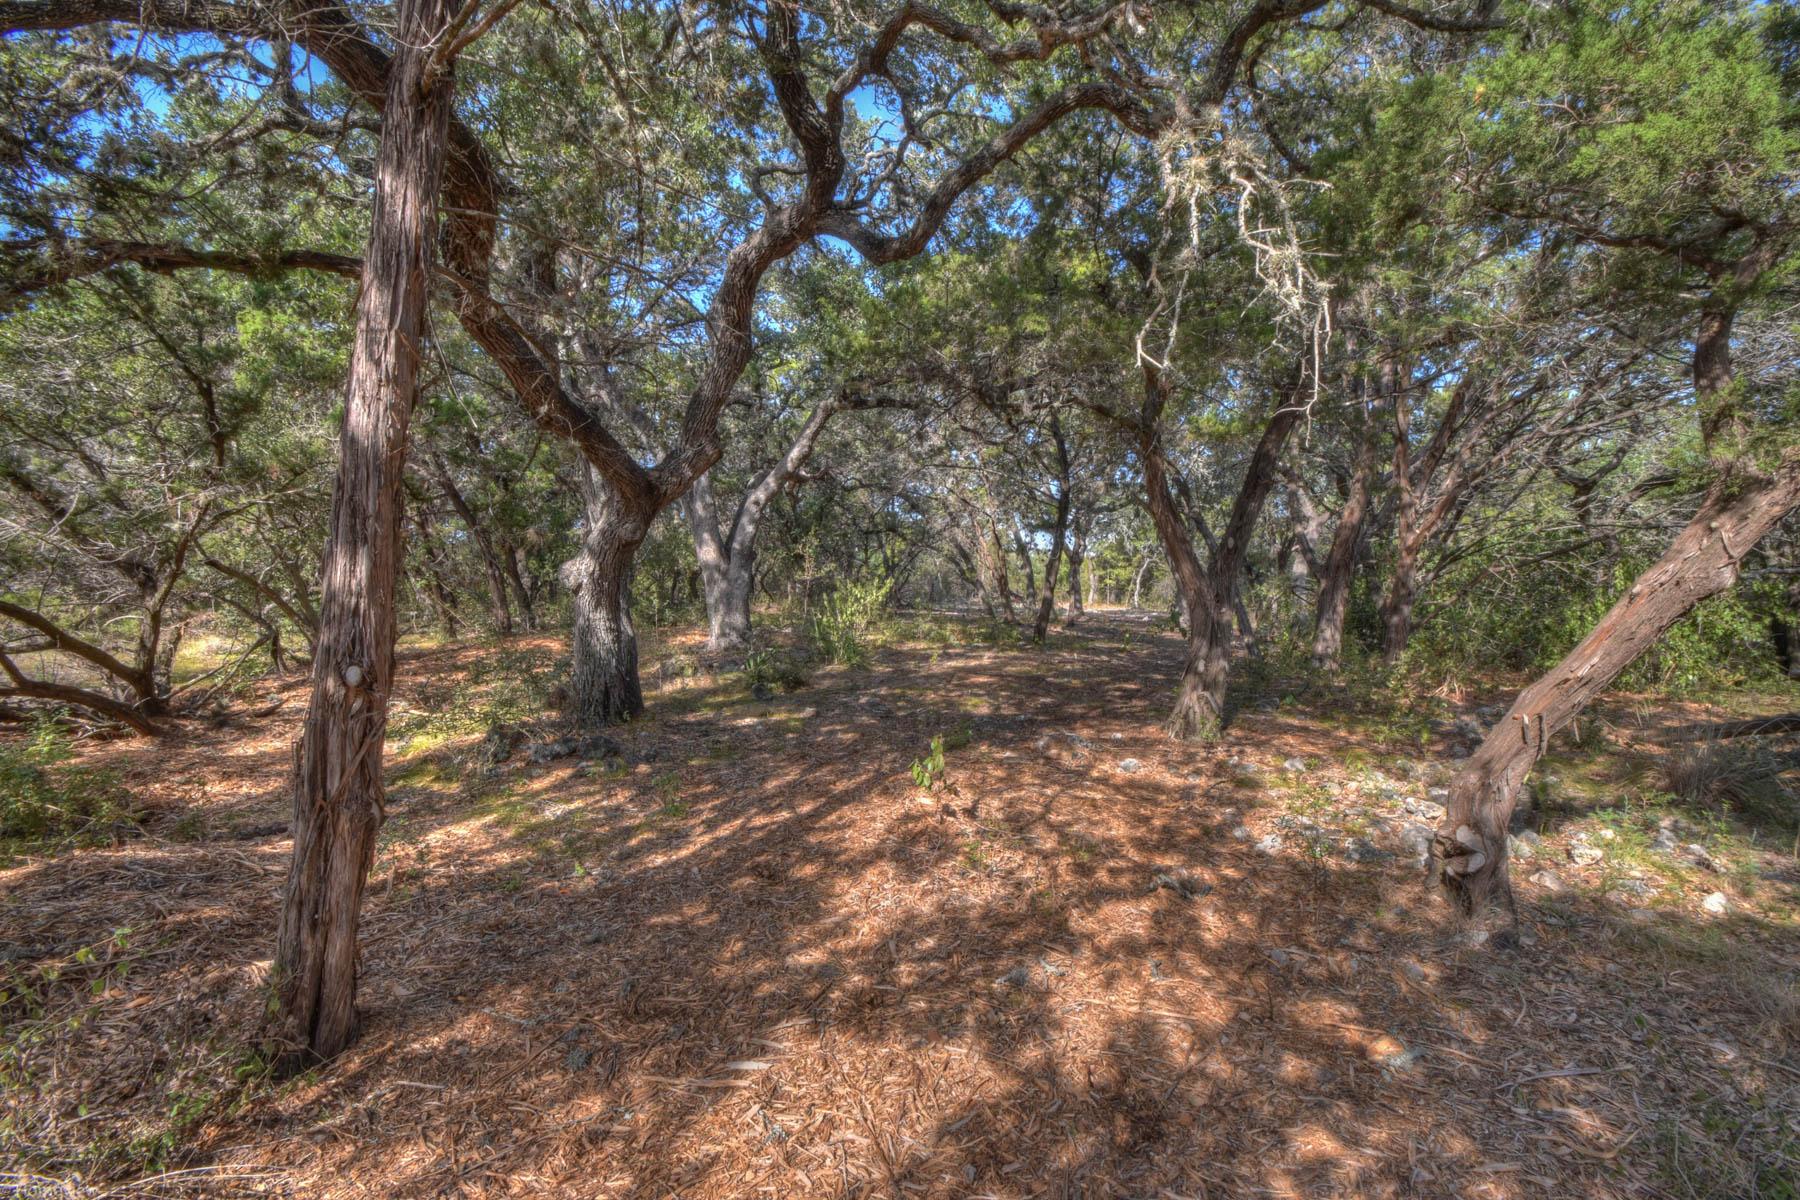 Land for Sale at 2+ Acres in Shavano Park 14700 NW Military Shavano Park, San Antonio, Texas 78231 United States